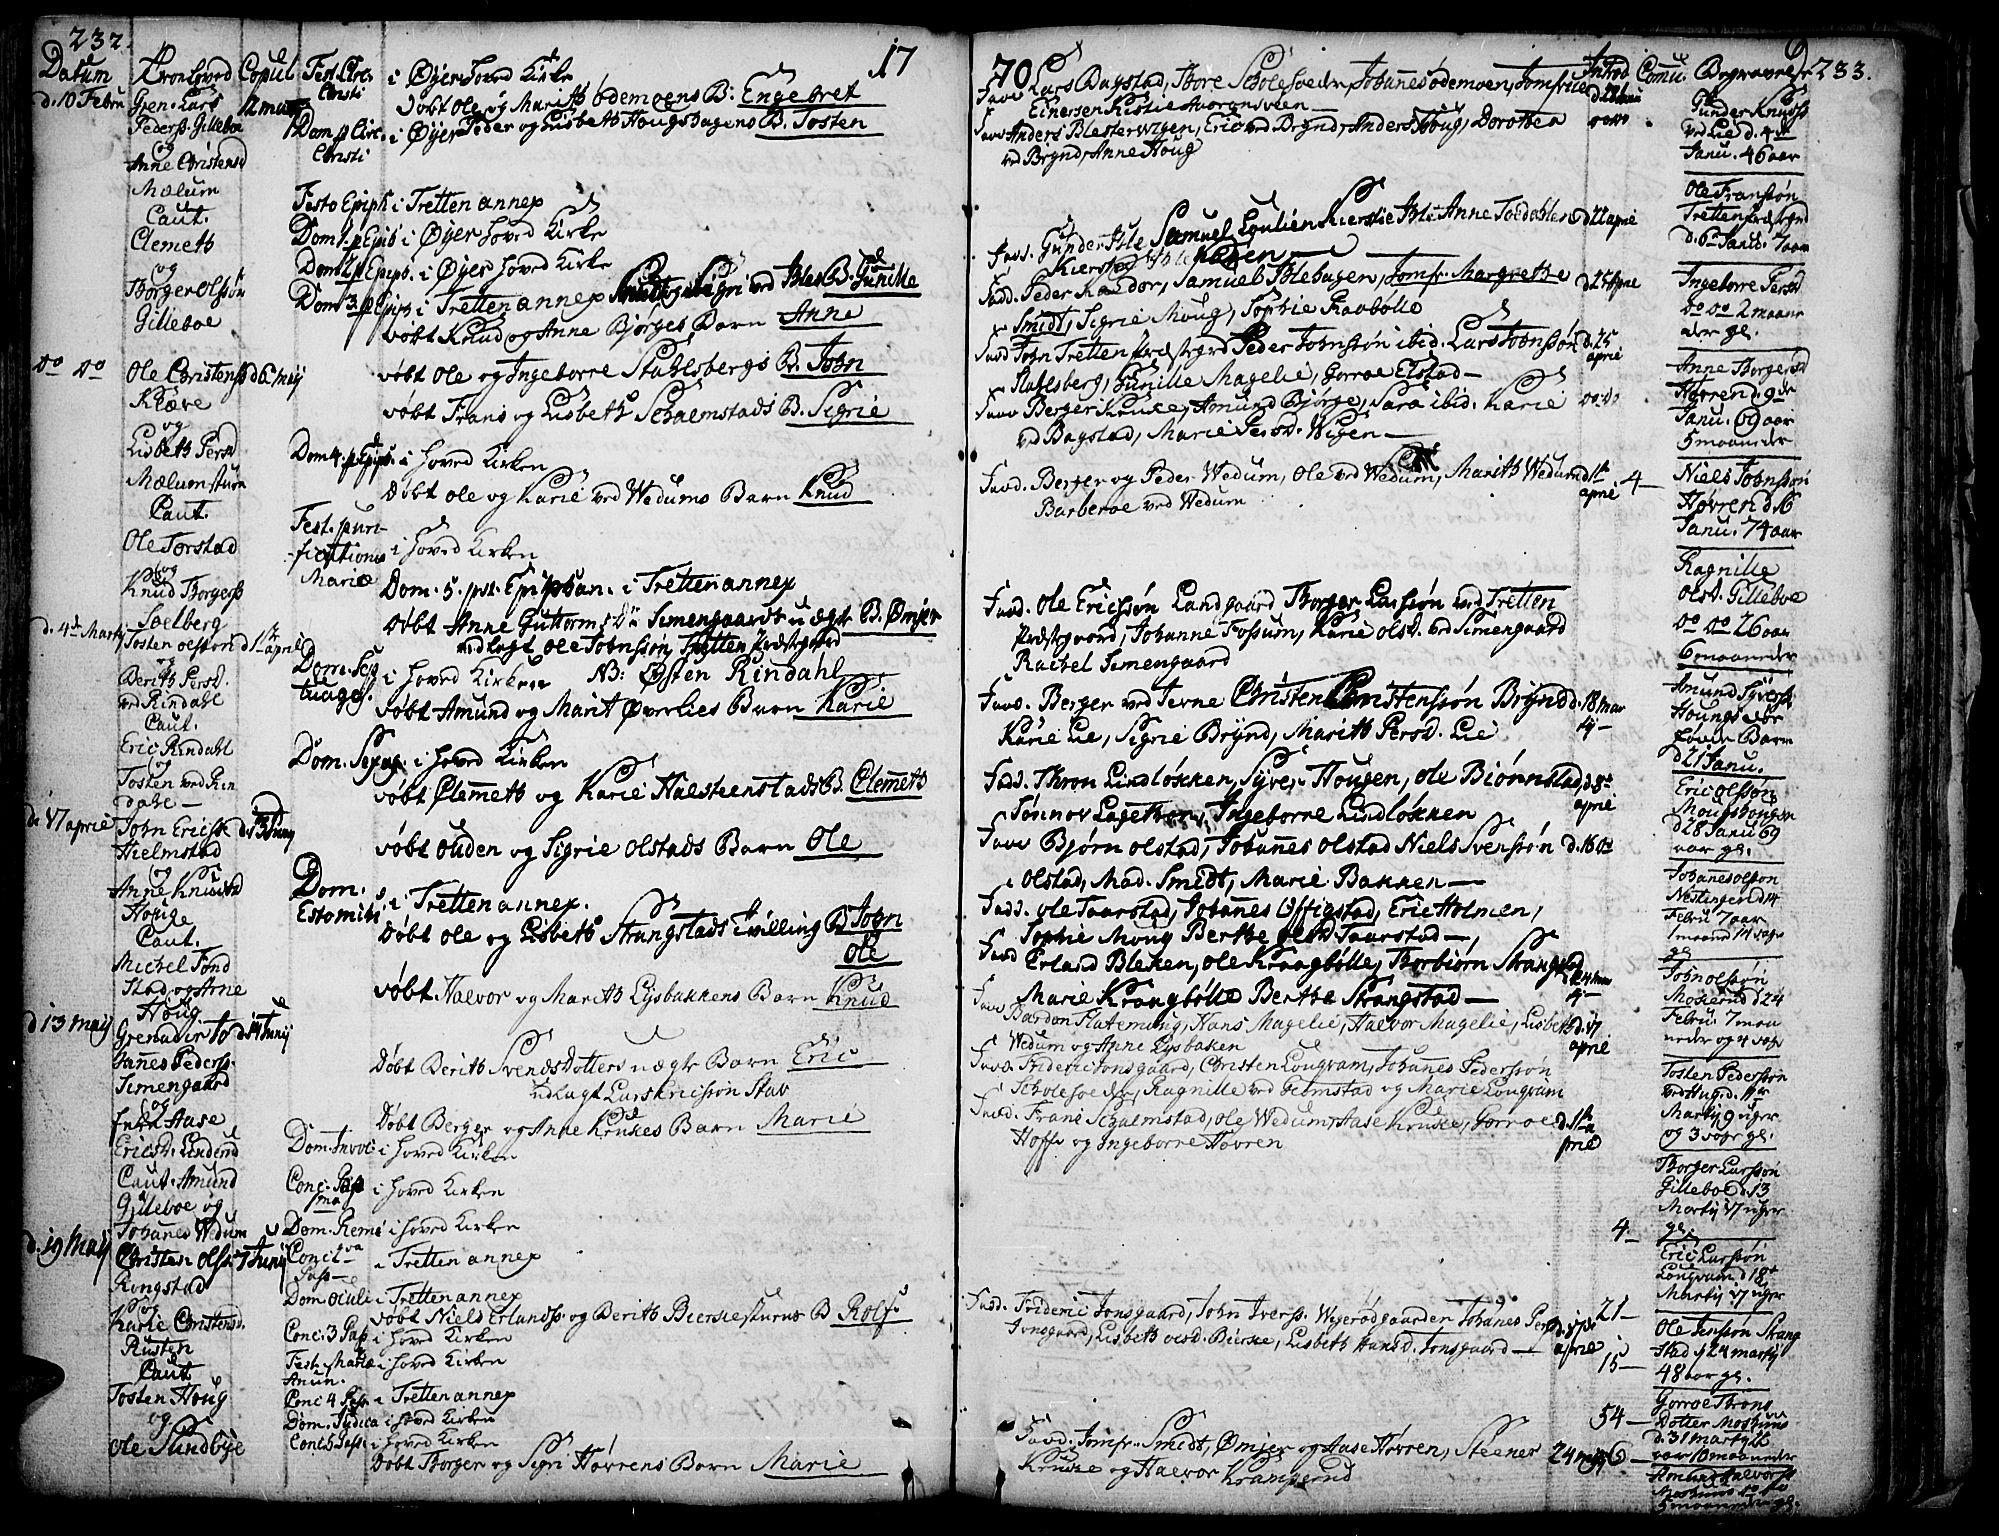 SAH, Øyer prestekontor, Ministerialbok nr. 2, 1733-1784, s. 232-233